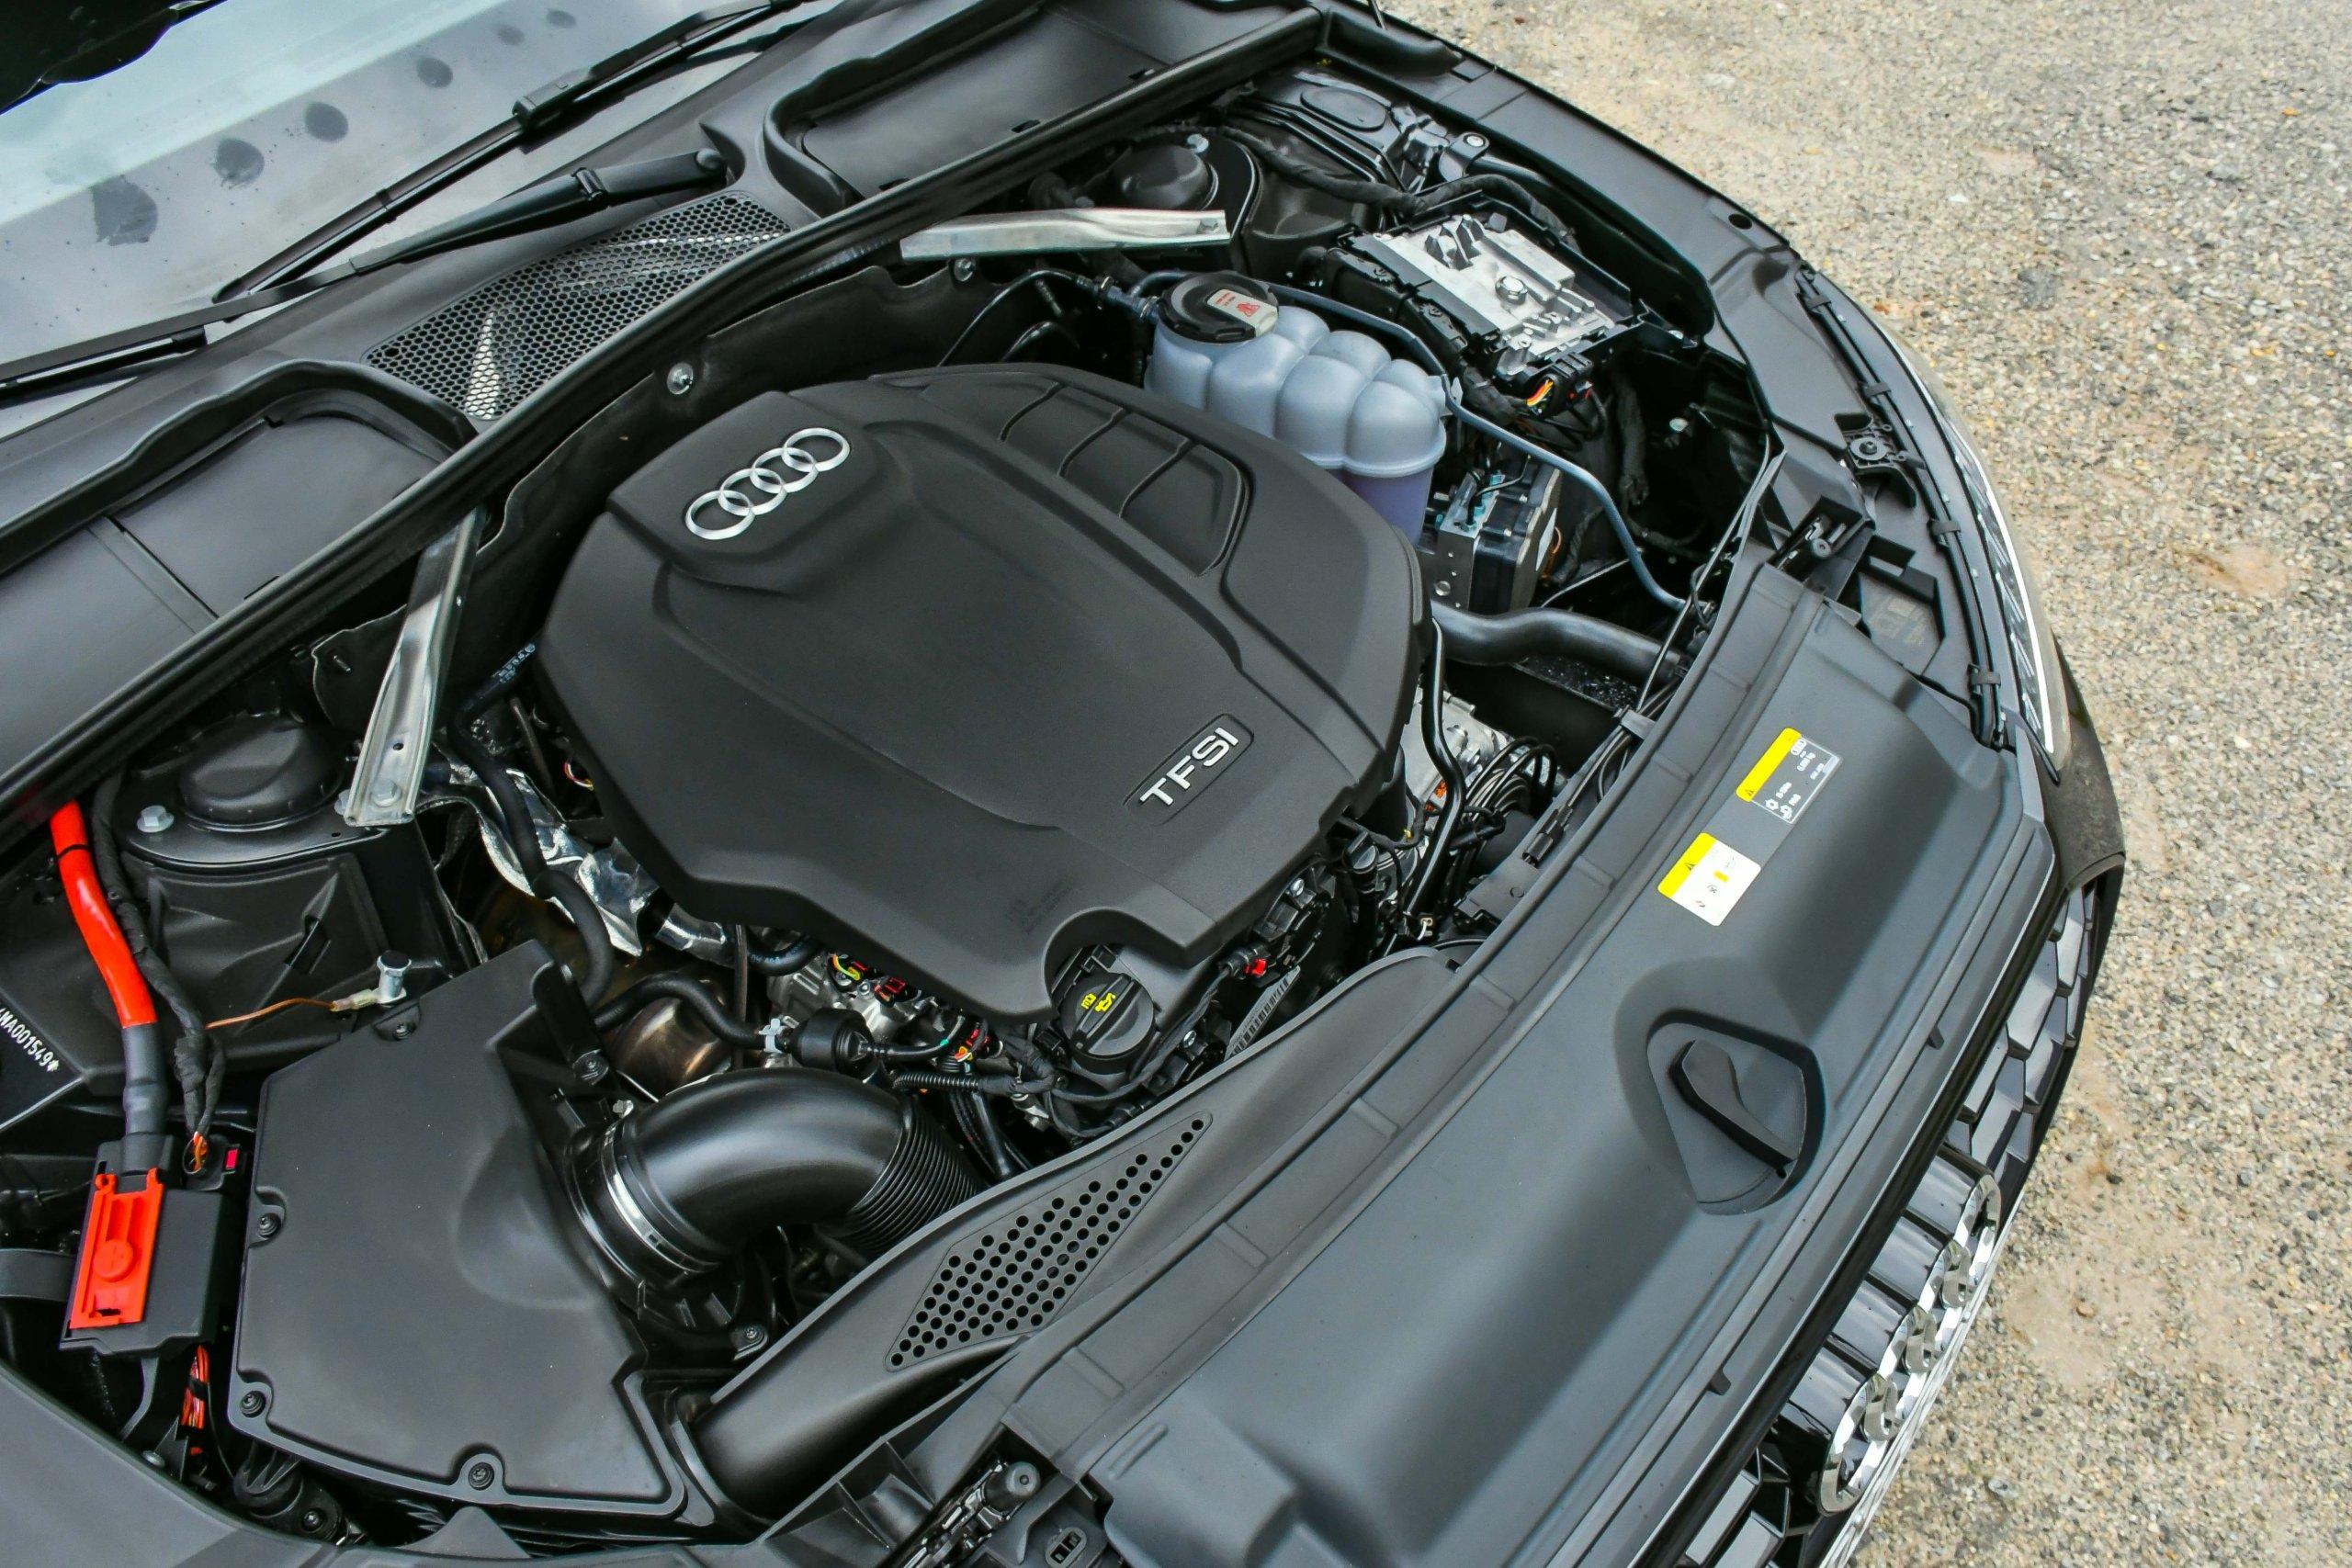 Audi A4 Performance Black 2021 Motor Longe